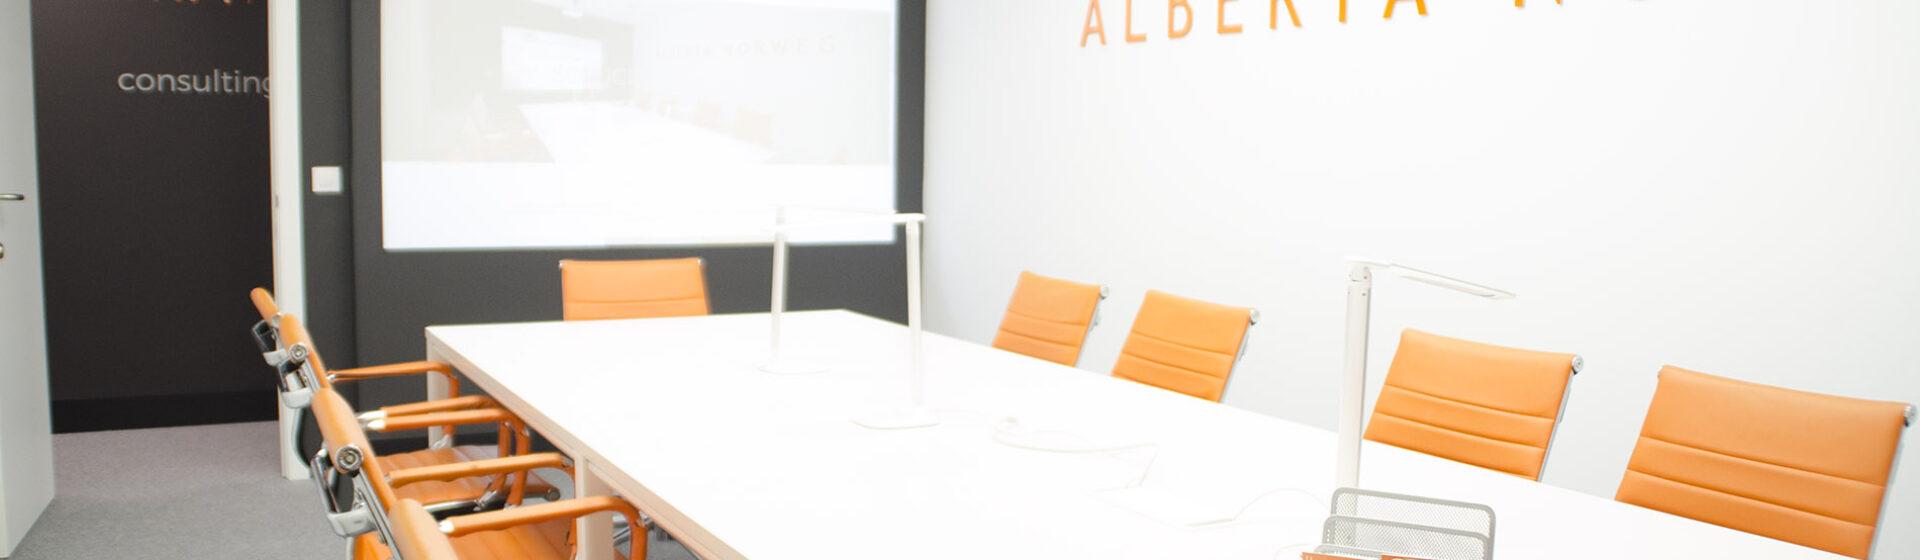 alberta-sala-reuniones-oficines